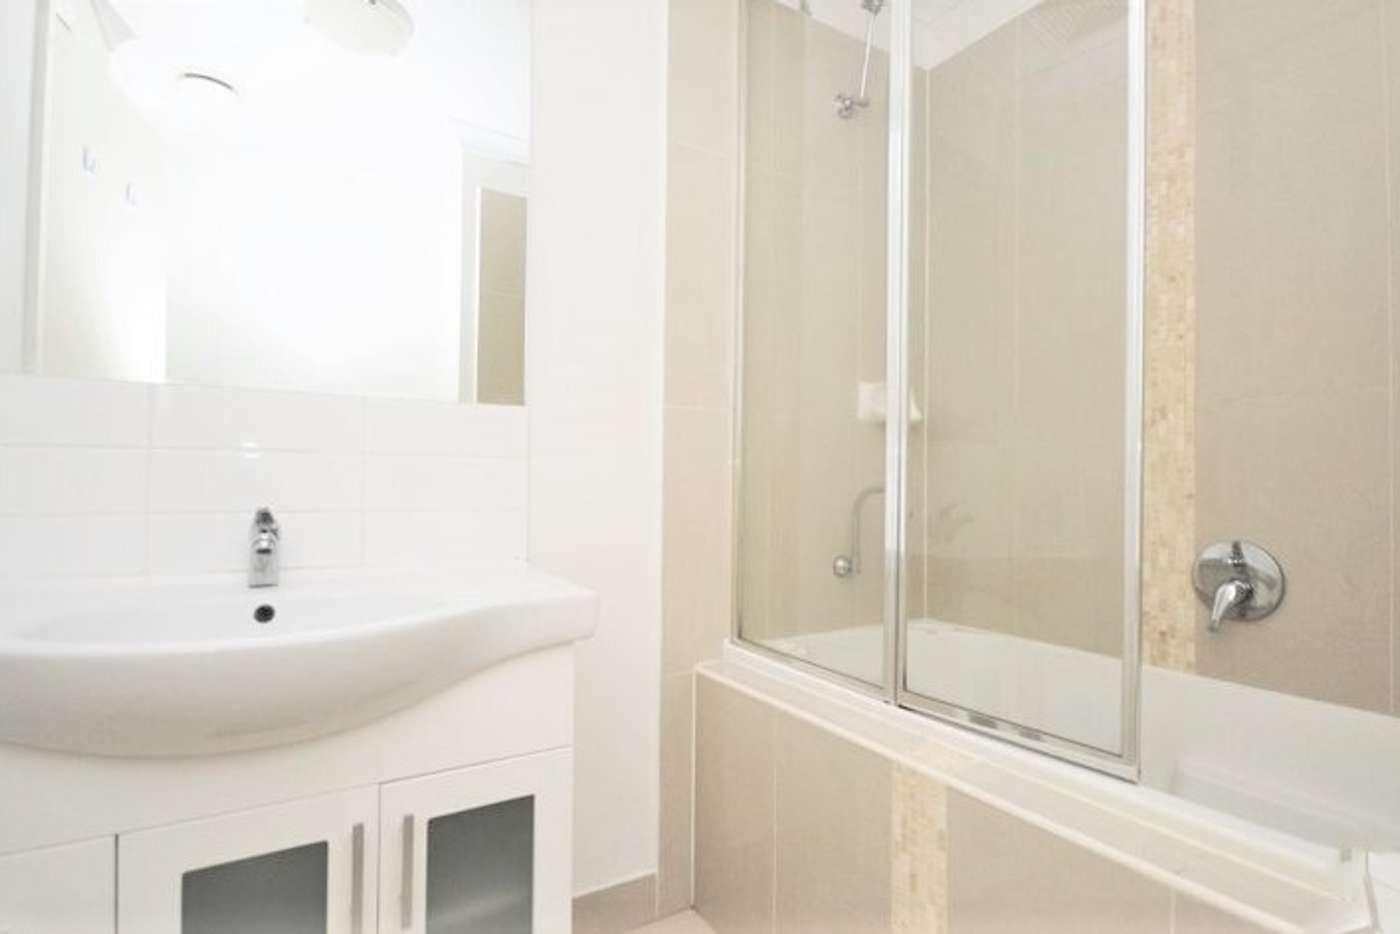 Seventh view of Homely apartment listing, 208A/41 Stockade Avenue, Coburg VIC 3058